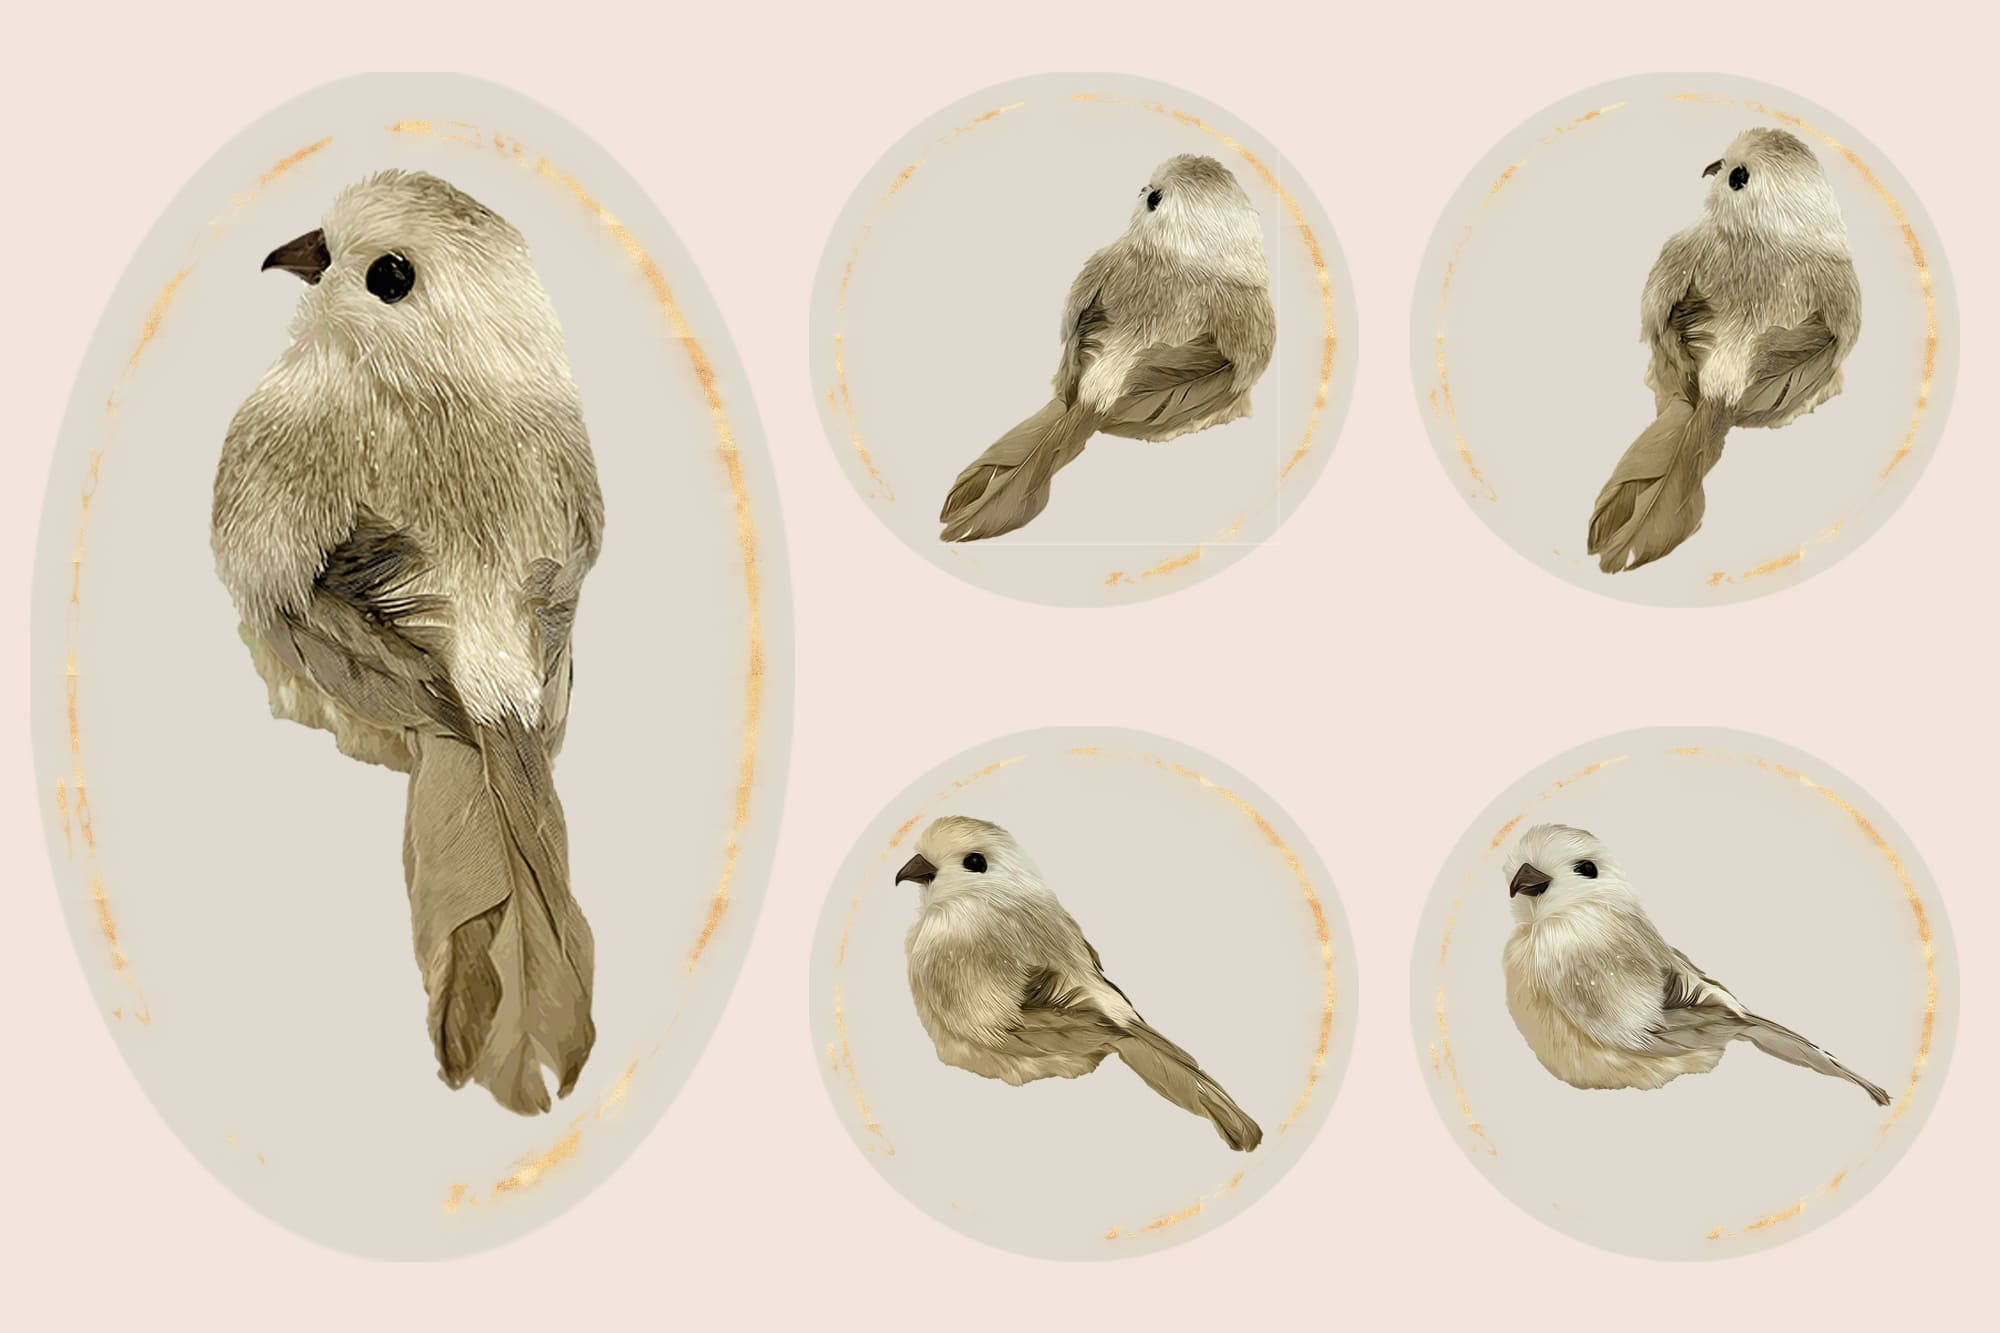 496 Christmas Illustrations: Christmas Vectors Bundle SVG, EPS, AI - Birds 3c